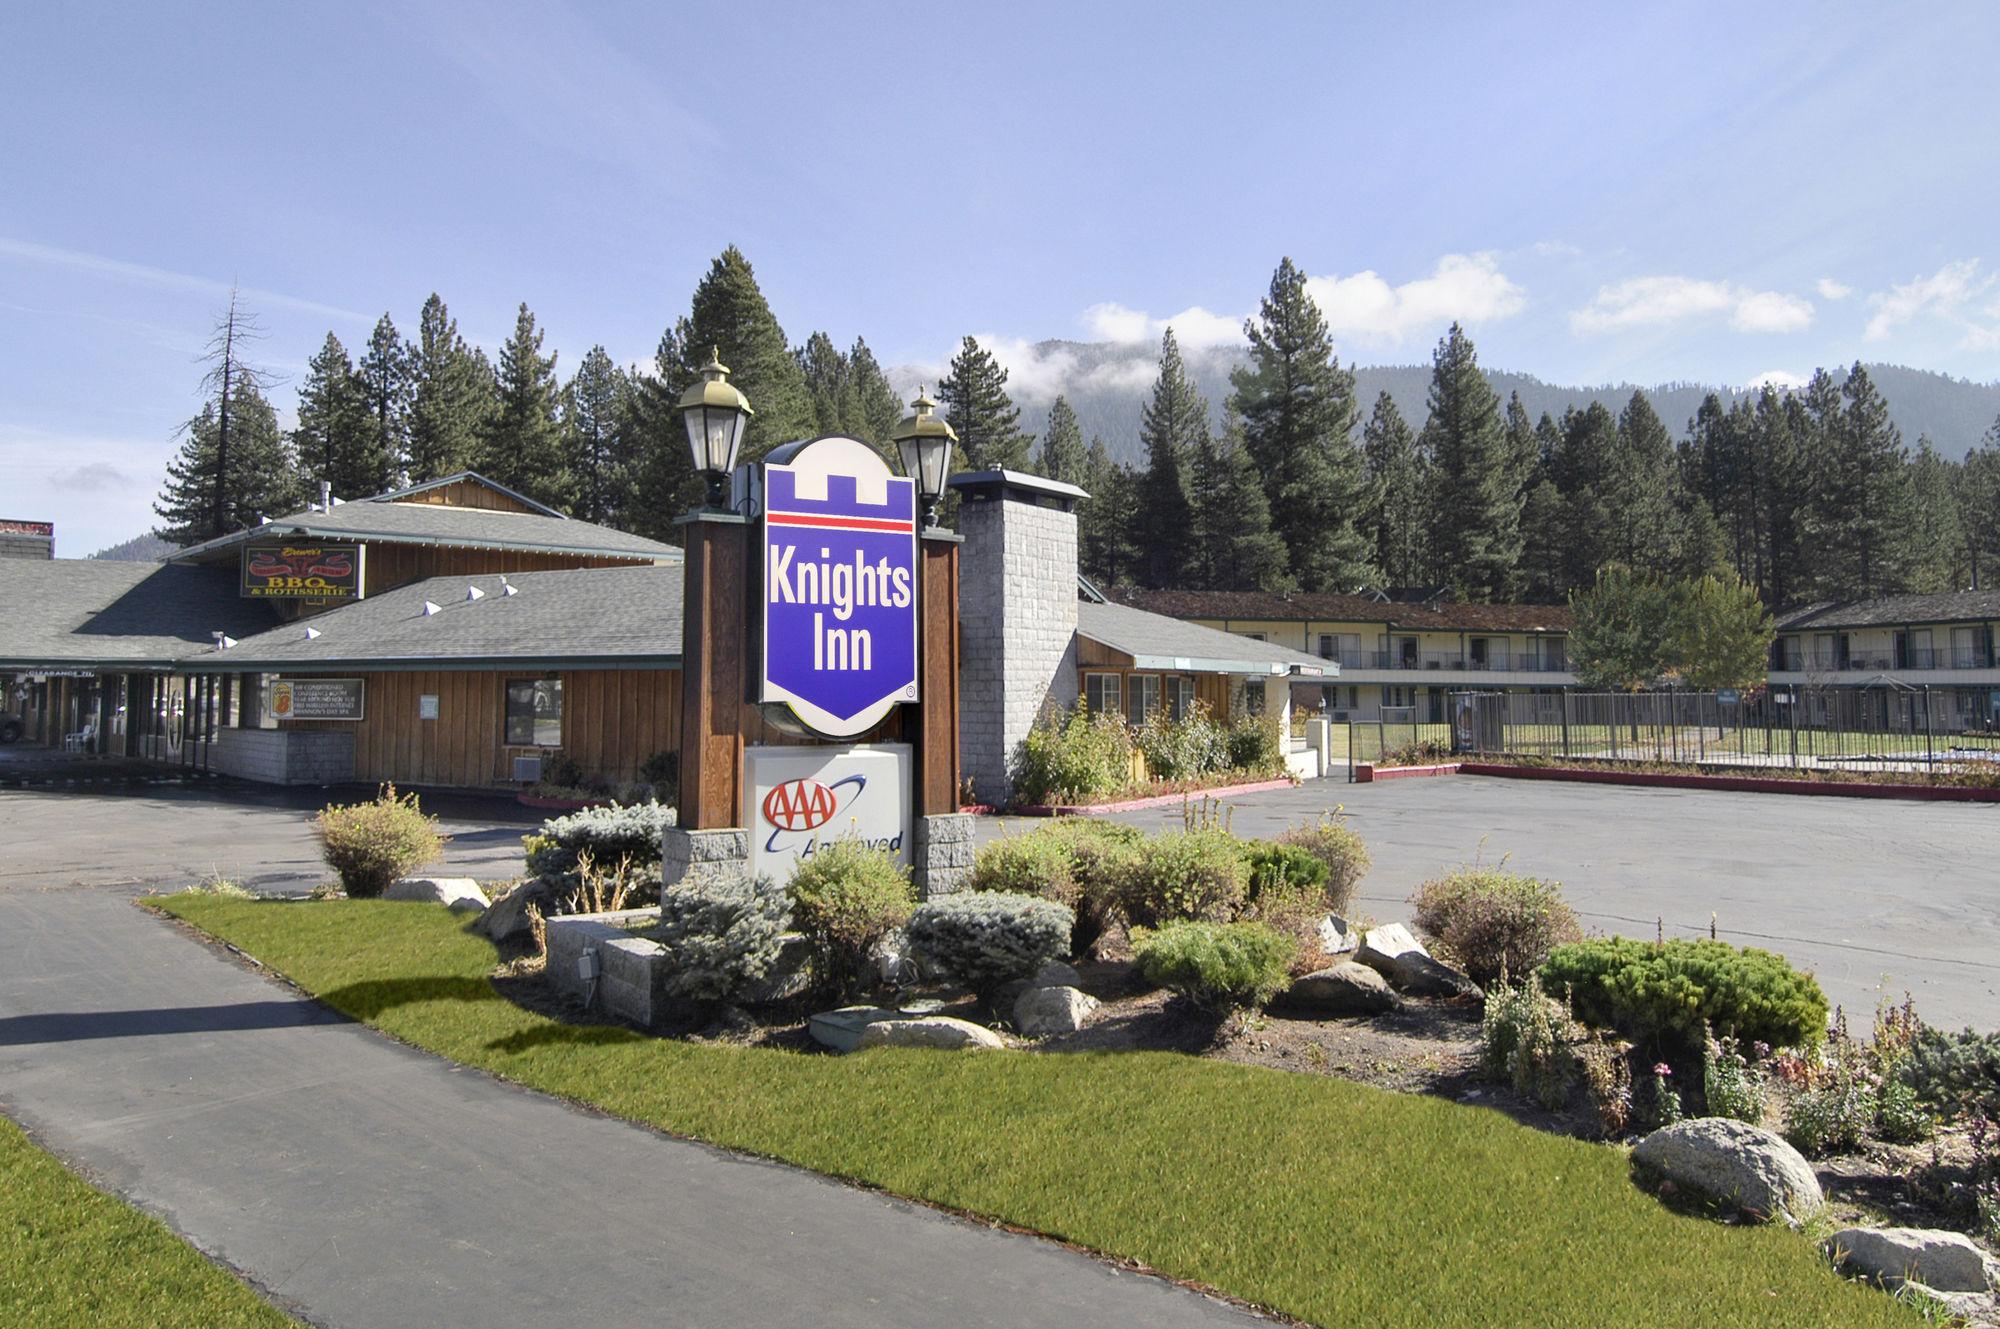 South Lake Tahoe Hotel Coupons For South Lake Tahoe